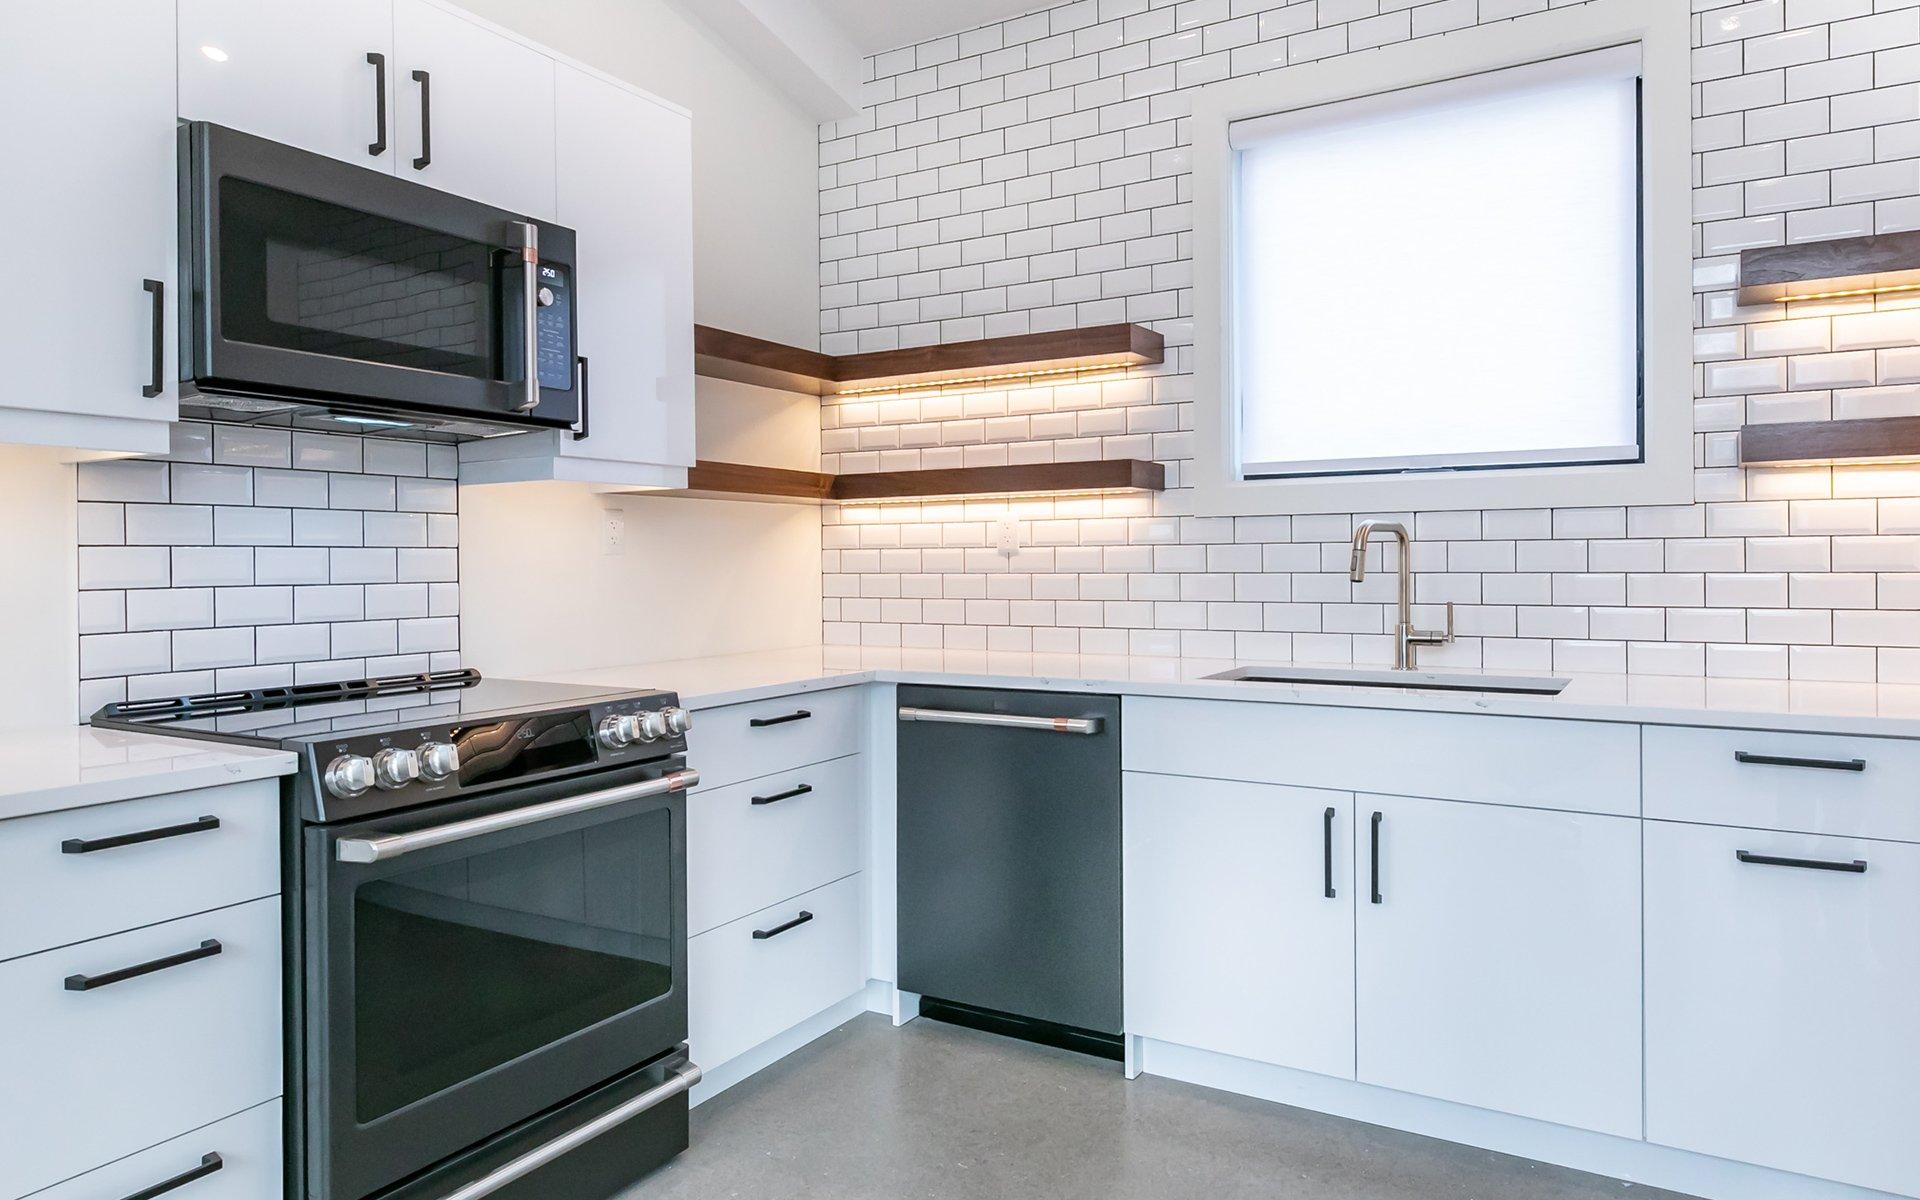 Lensink kitchen renovation